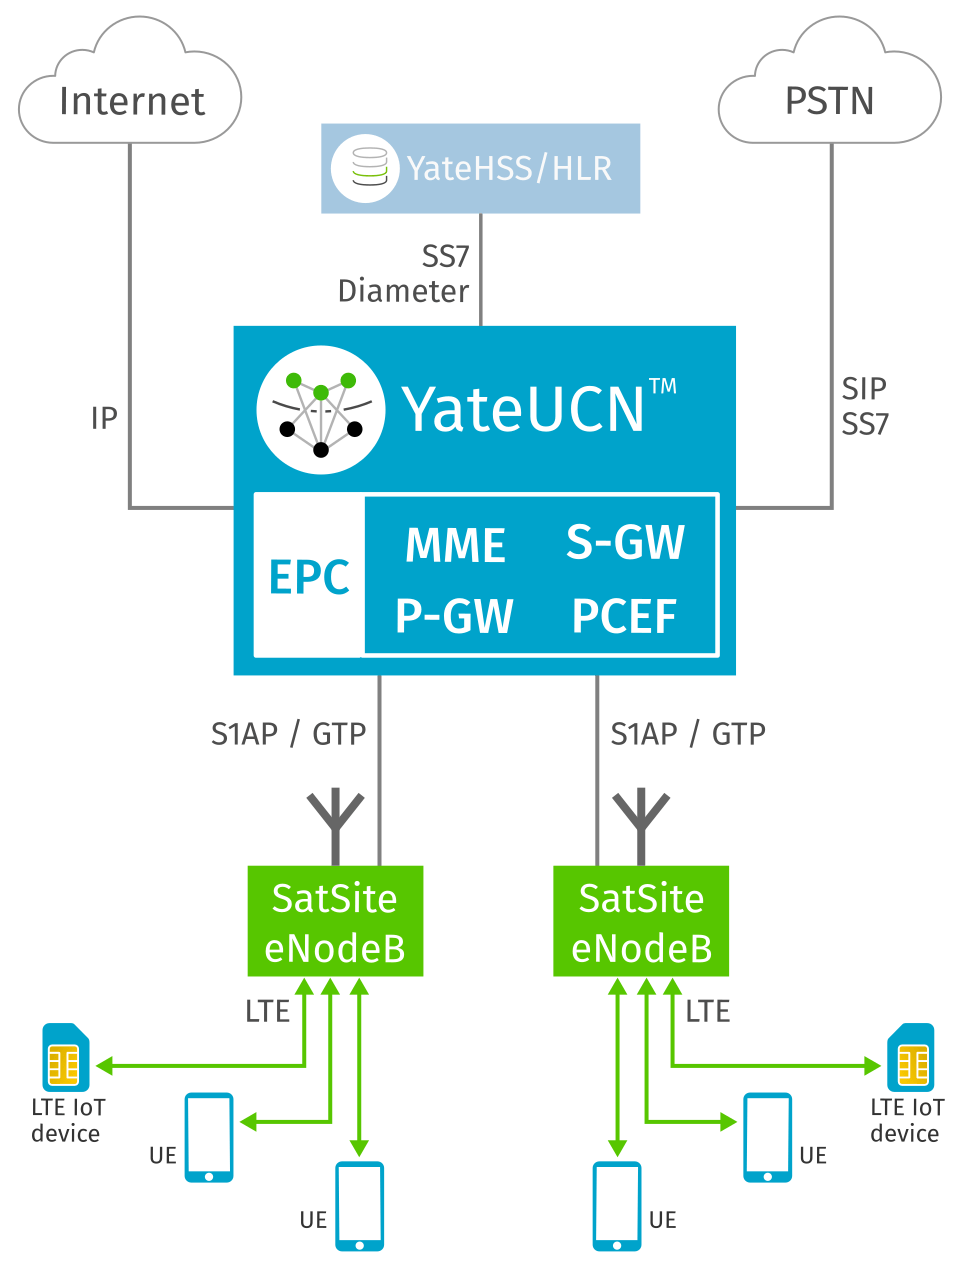 EPC in a YateUCN: MME, SGW, PGW, PCEF